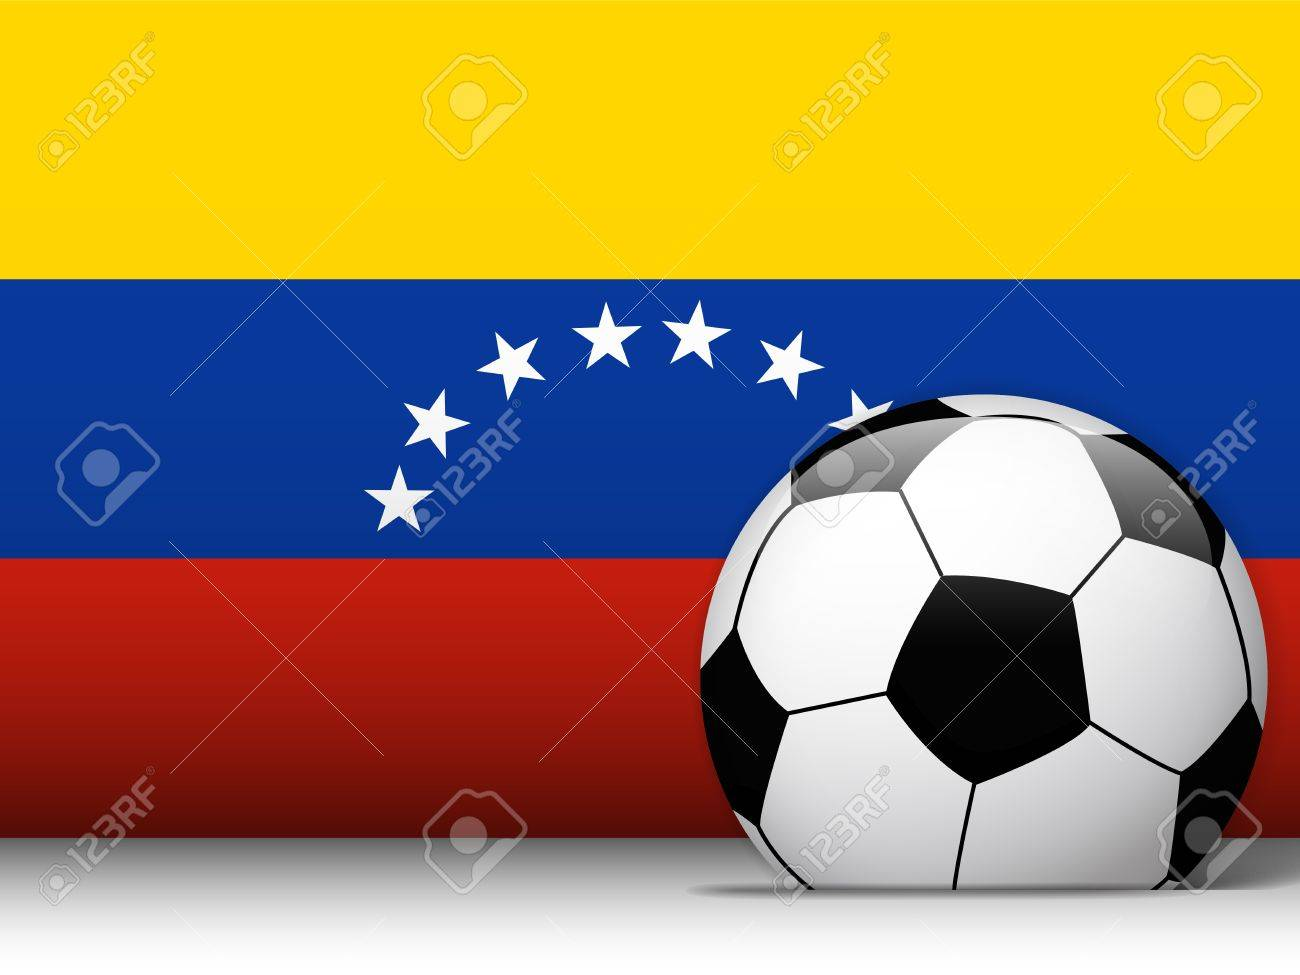 Vector - Venezuela Soccer Ball with Flag Background Stock Vector - 13814721